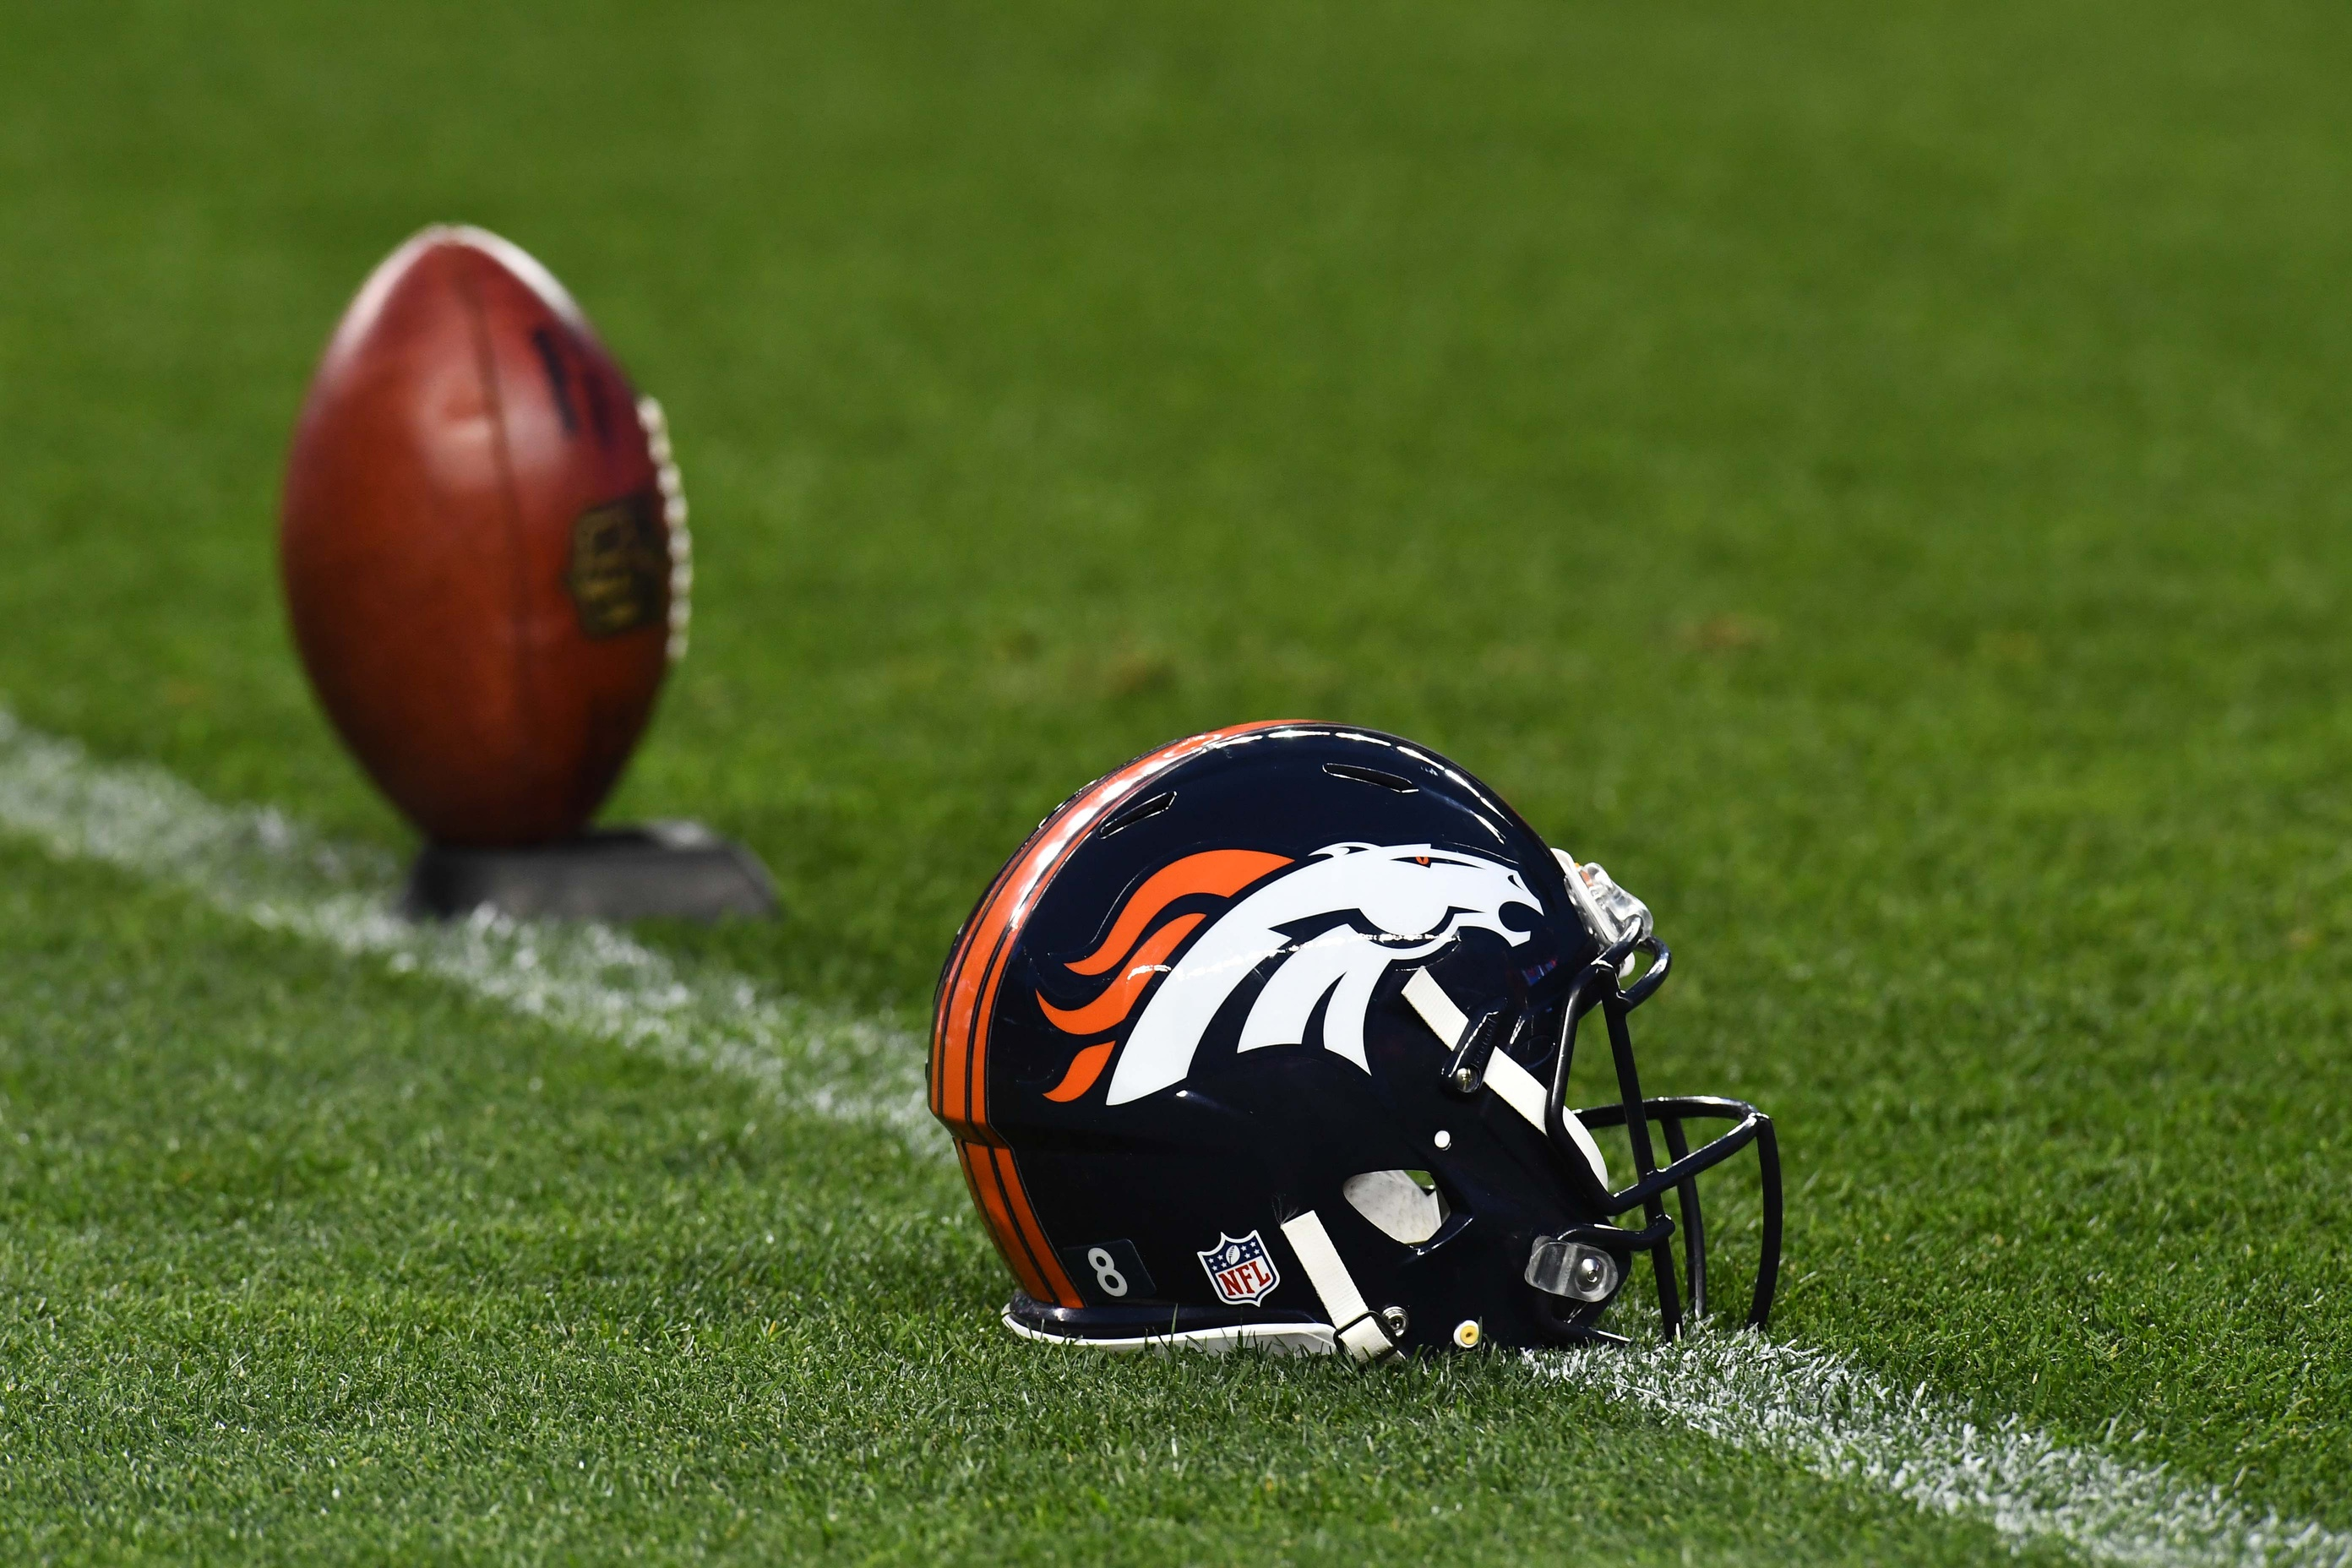 Broncos at Raiders play-by-playDenver Broncos - KLIS - KUSA - National Football League - NFL - Sanjak Of Klis - Sports Commentator - Twitter